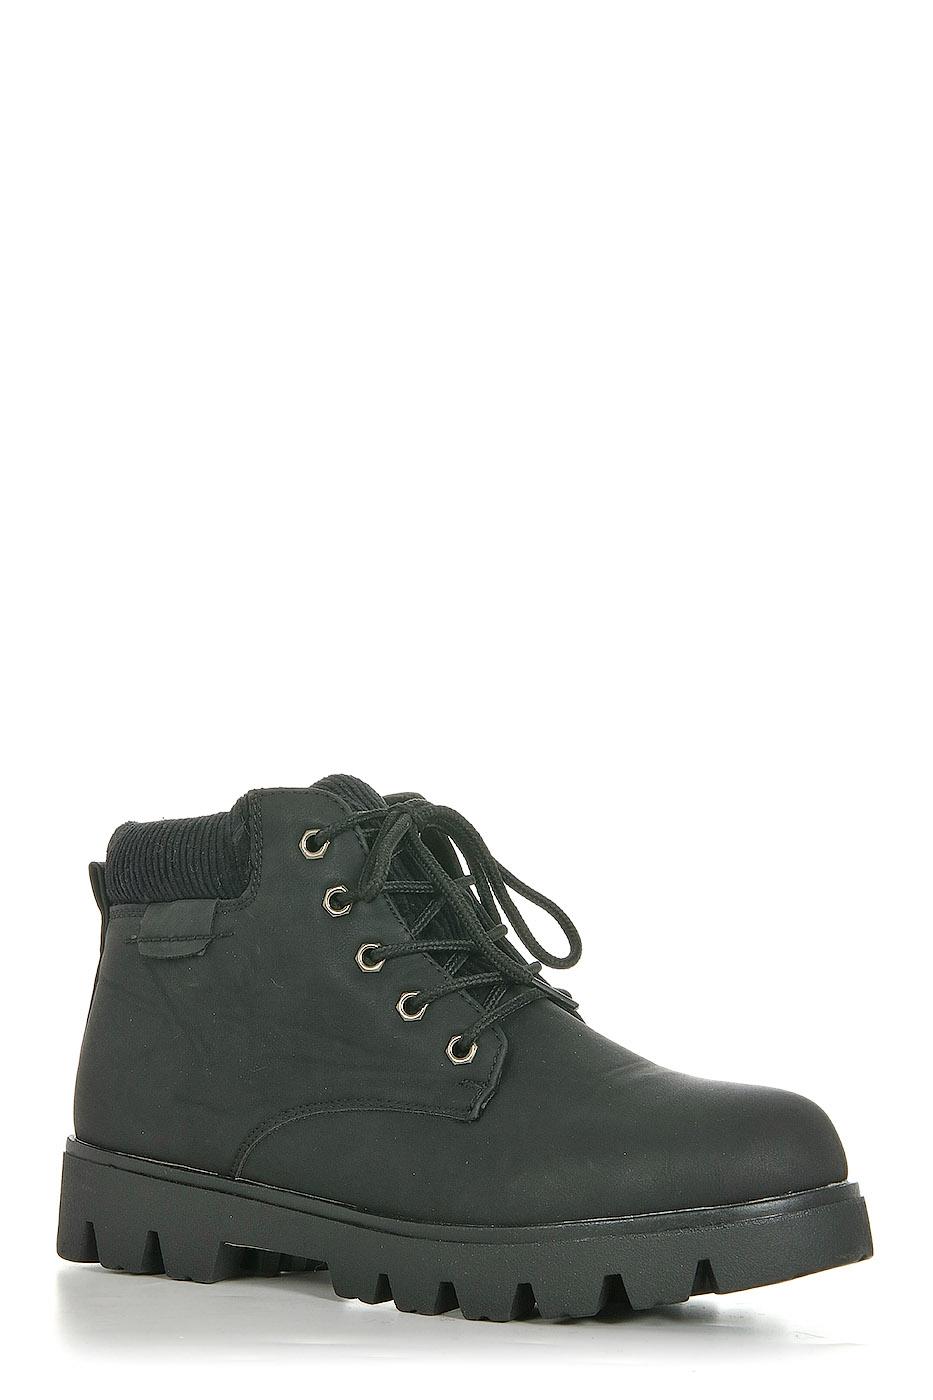 Ботинки TOPLAND2322-PB76182B/BLACK